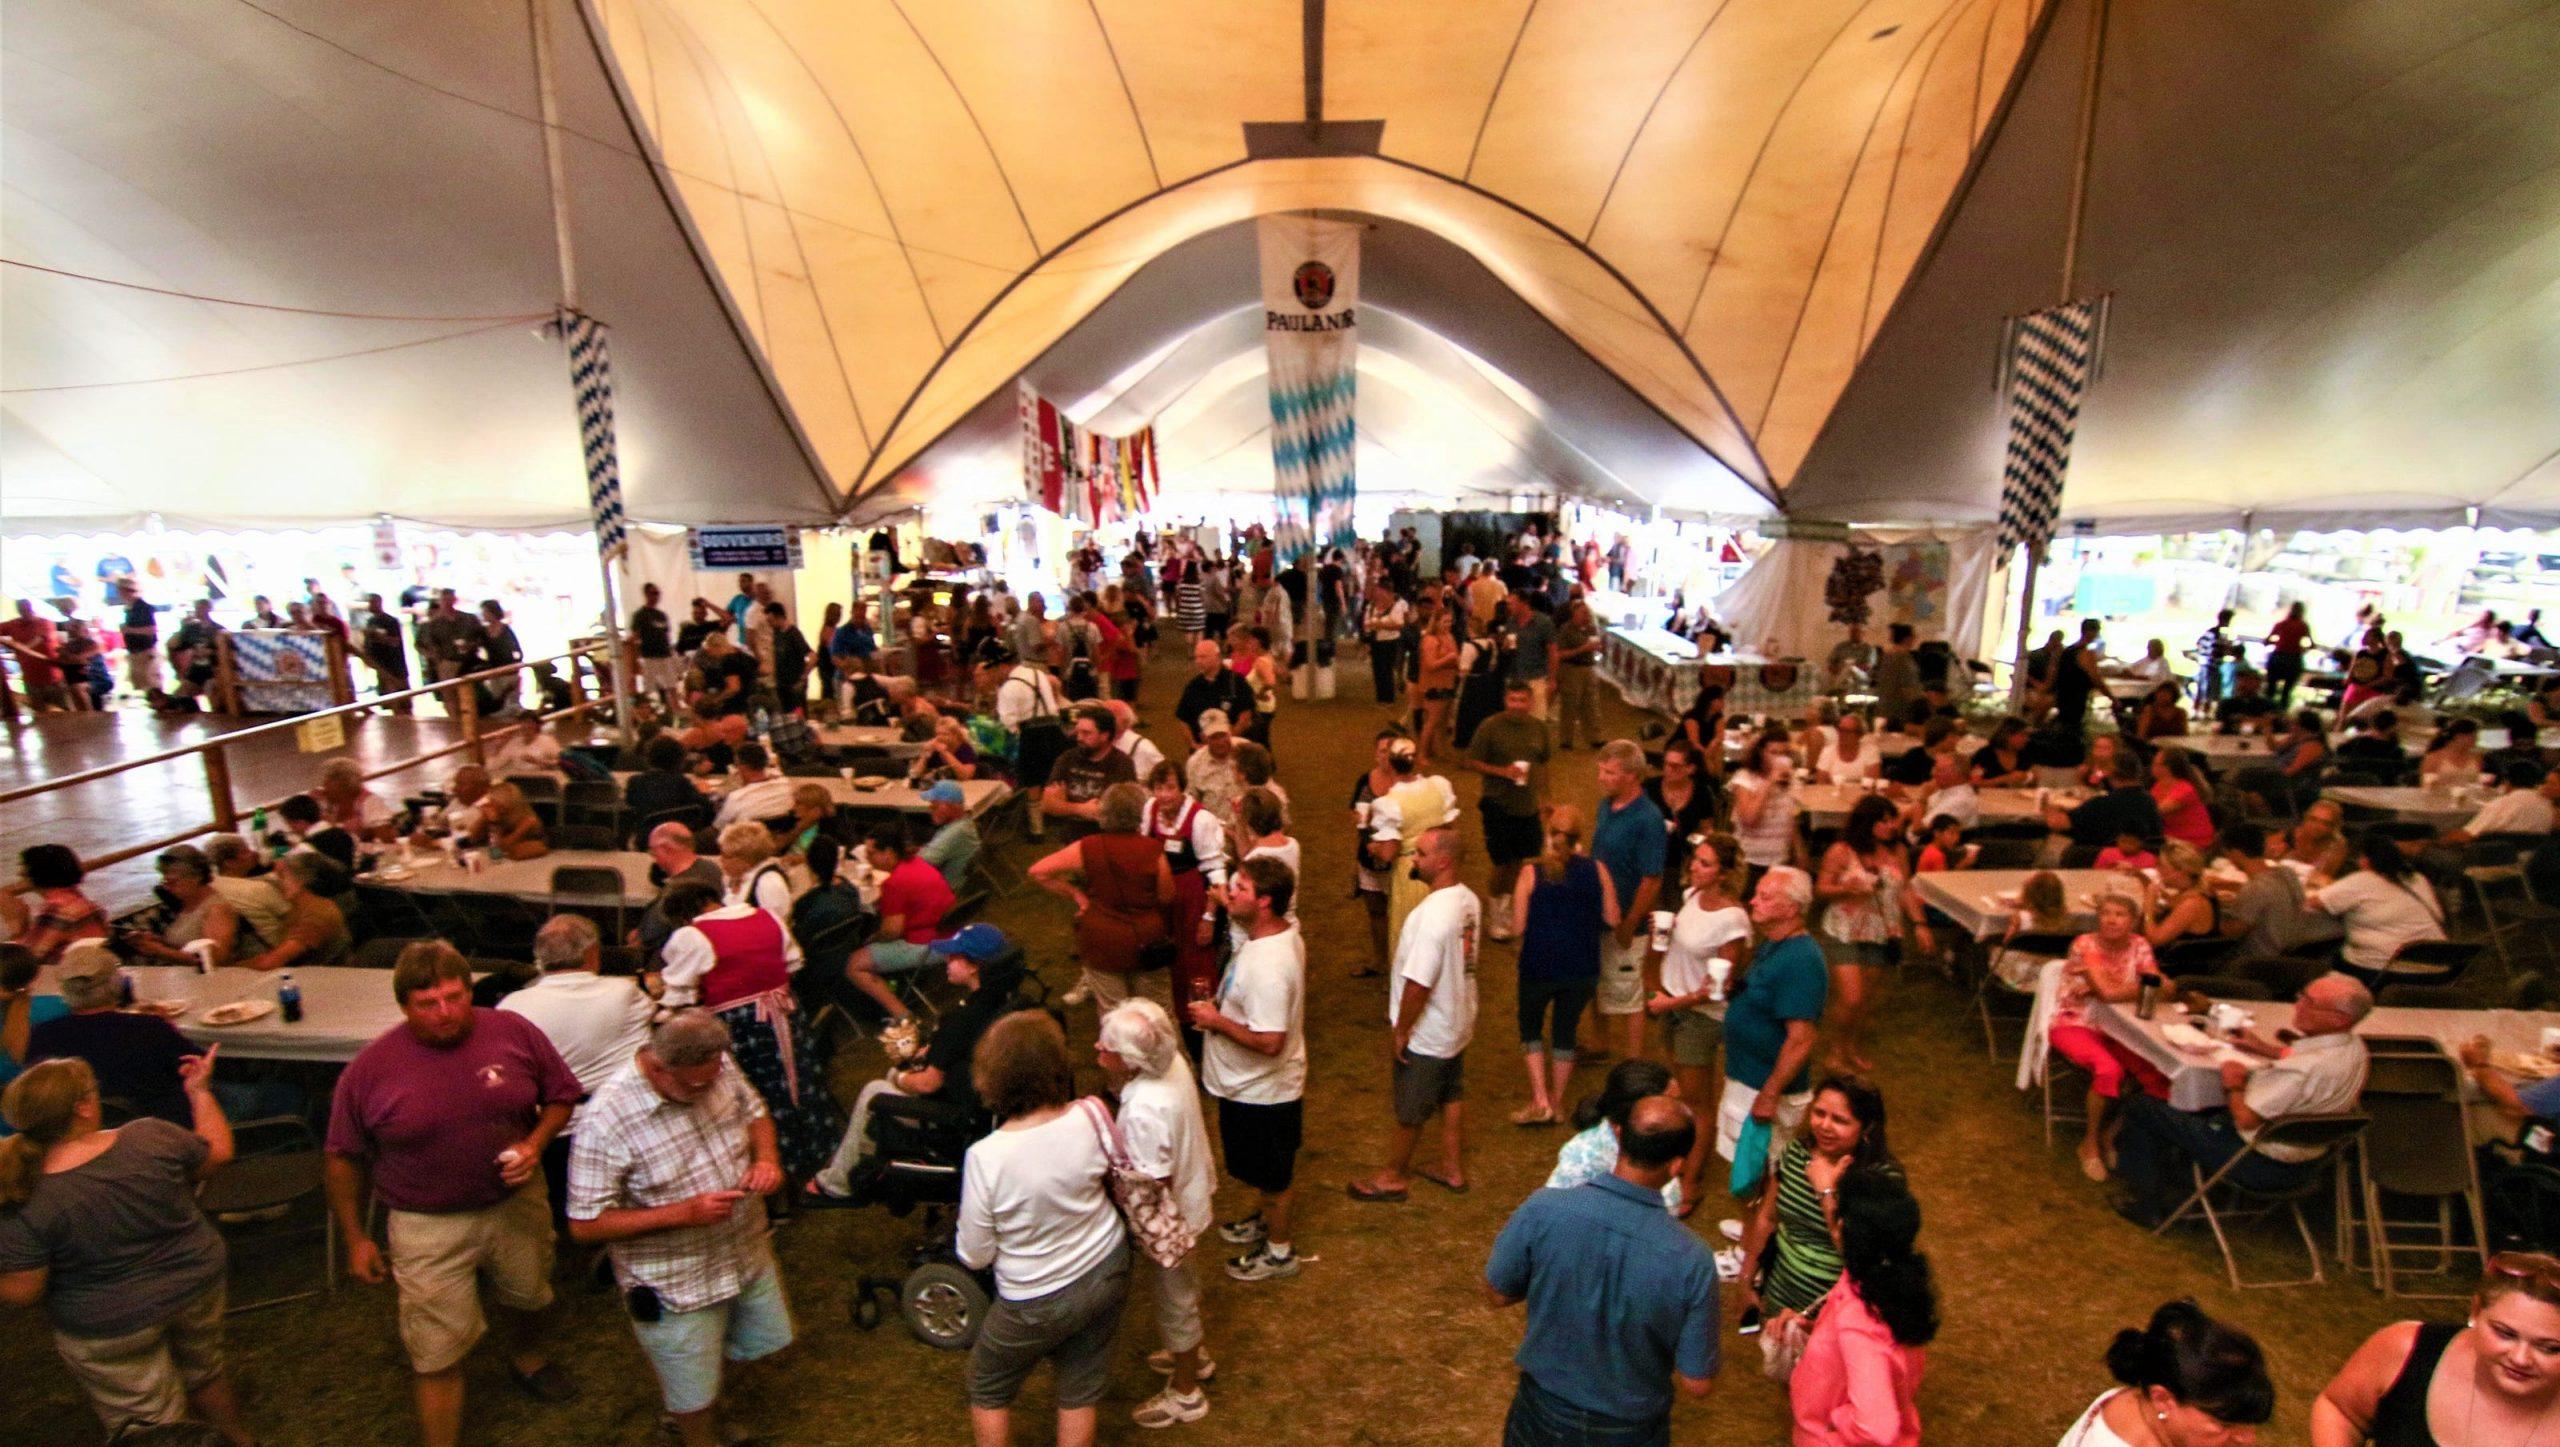 With No Delaware Saengerbund Oktoberfest This Weekend, You Can Still Get A Taste Here photo